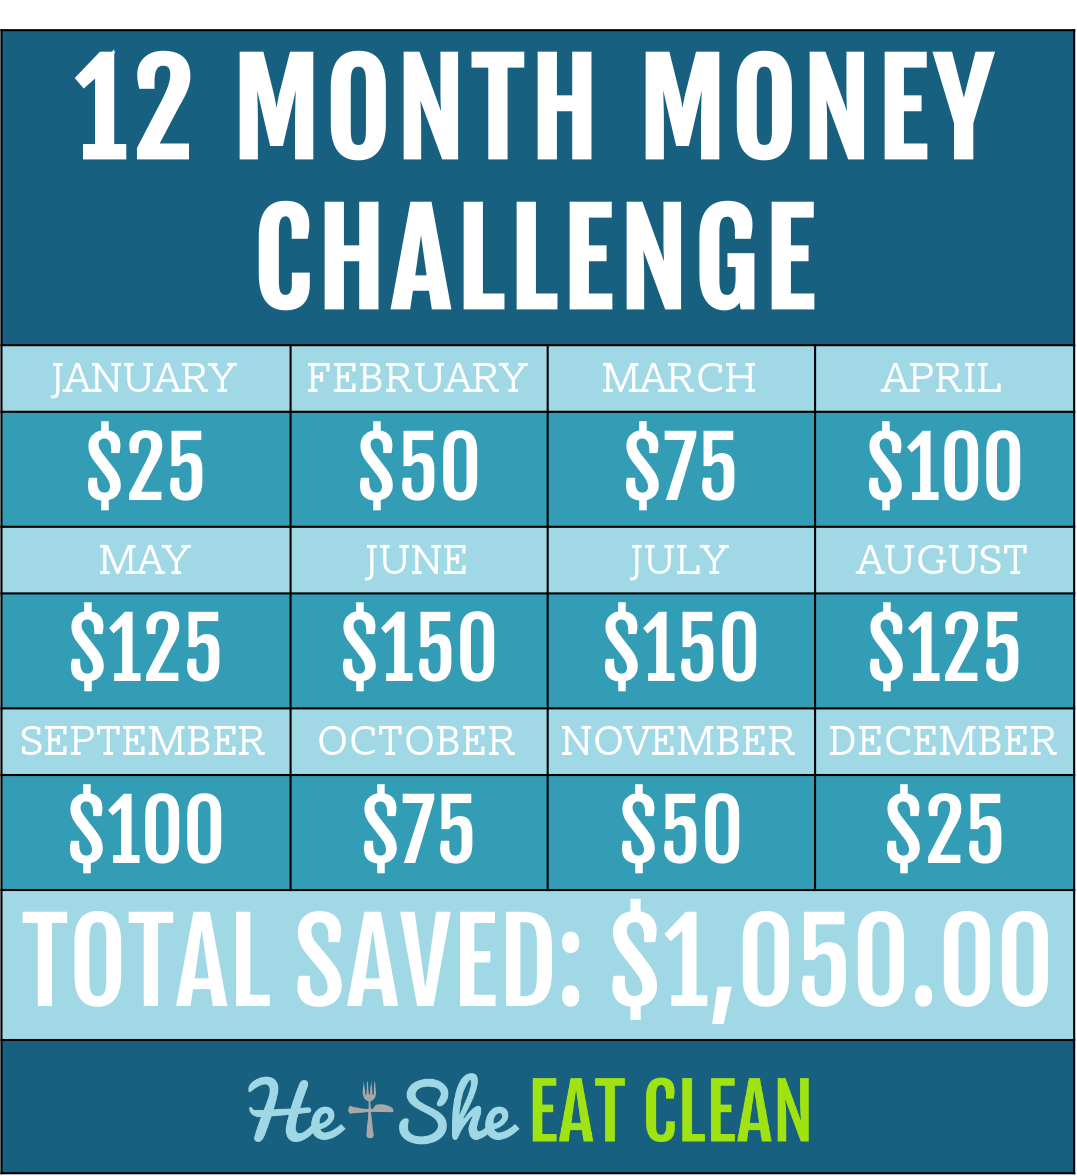 12 Month Money Challenge